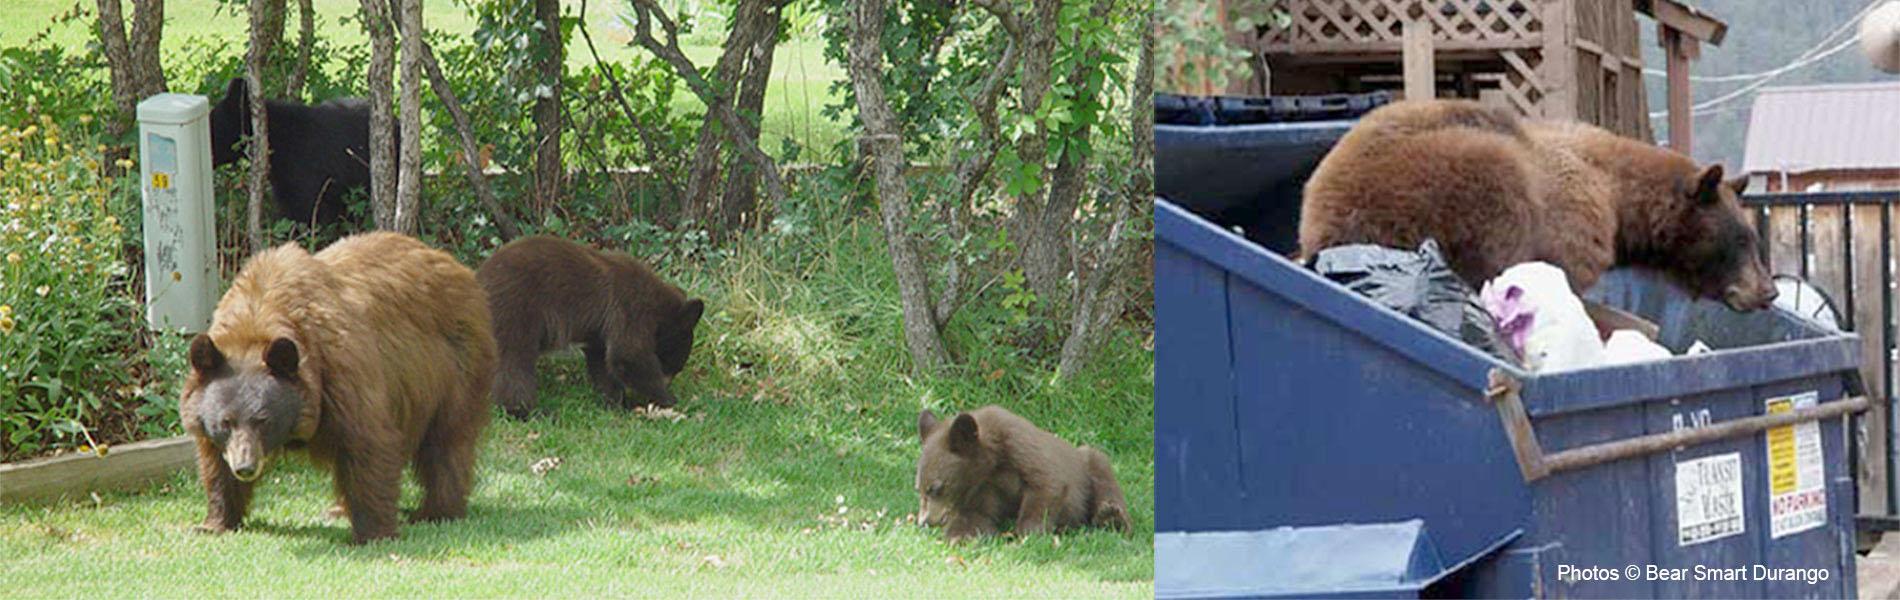 Got Bears?